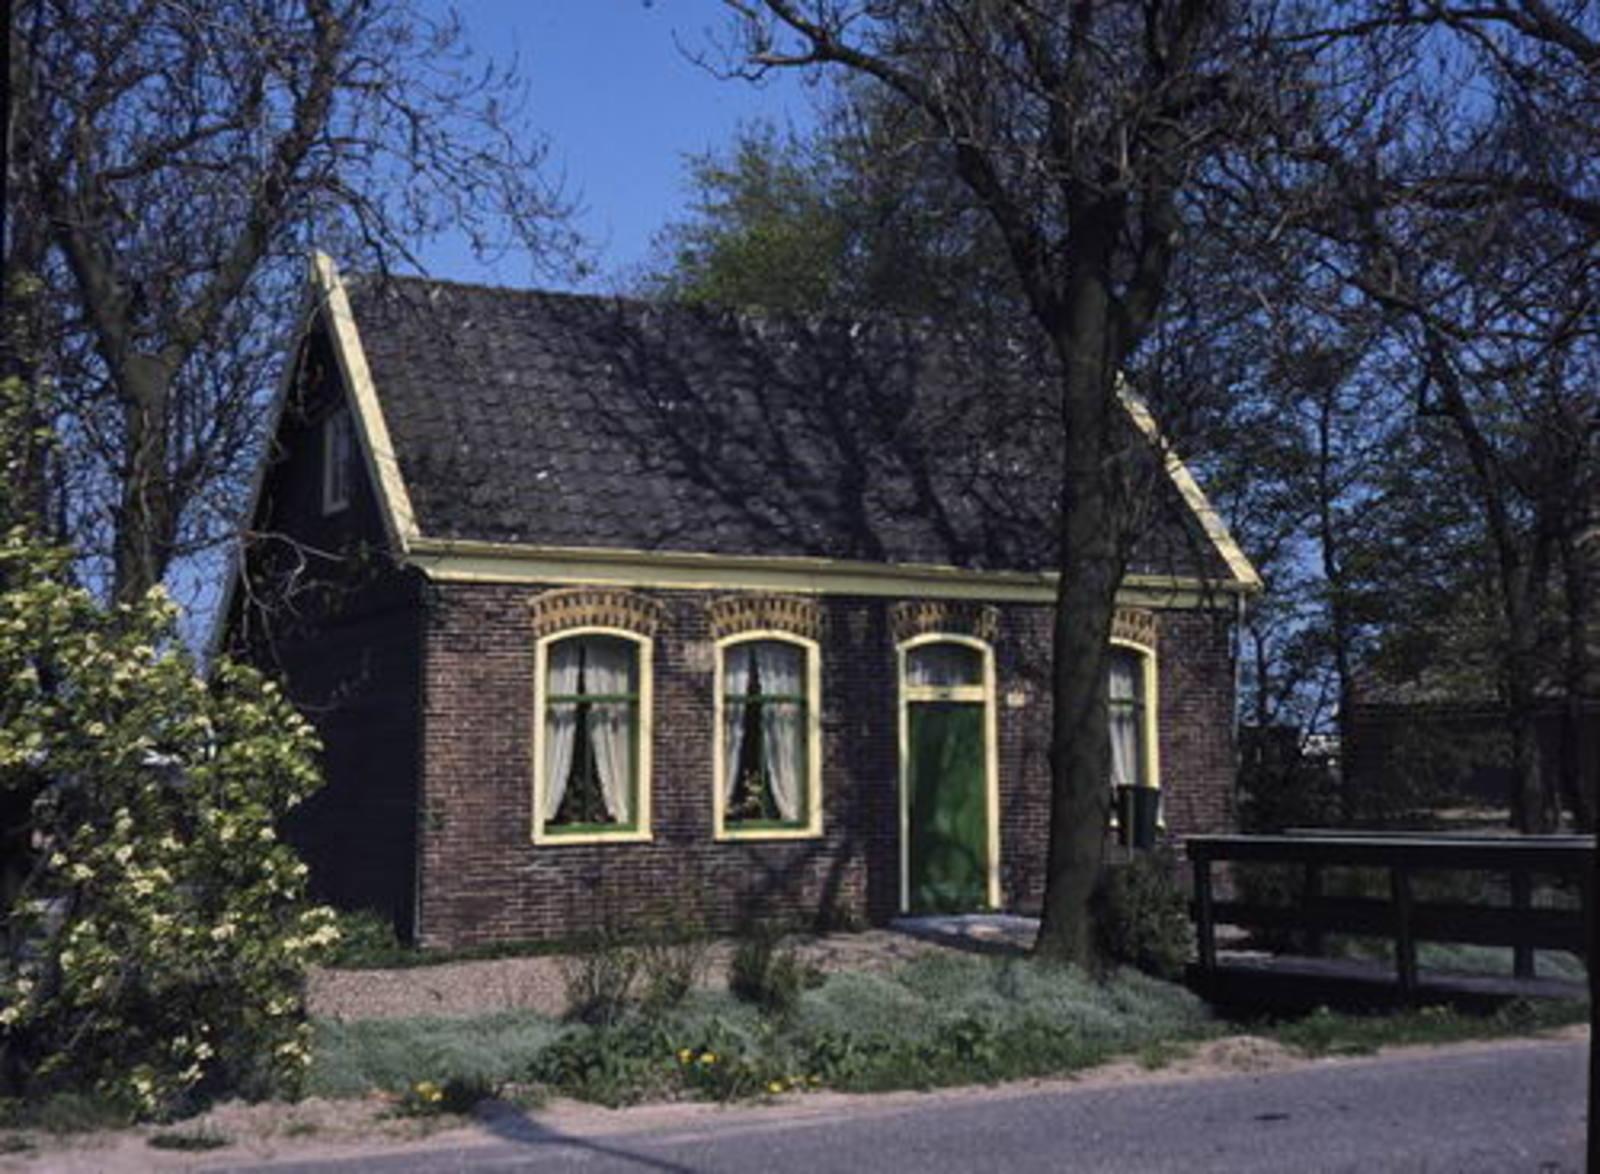 Aalsmeerderweg W 0373 19__ De Zwaluw Arbeidershuisje